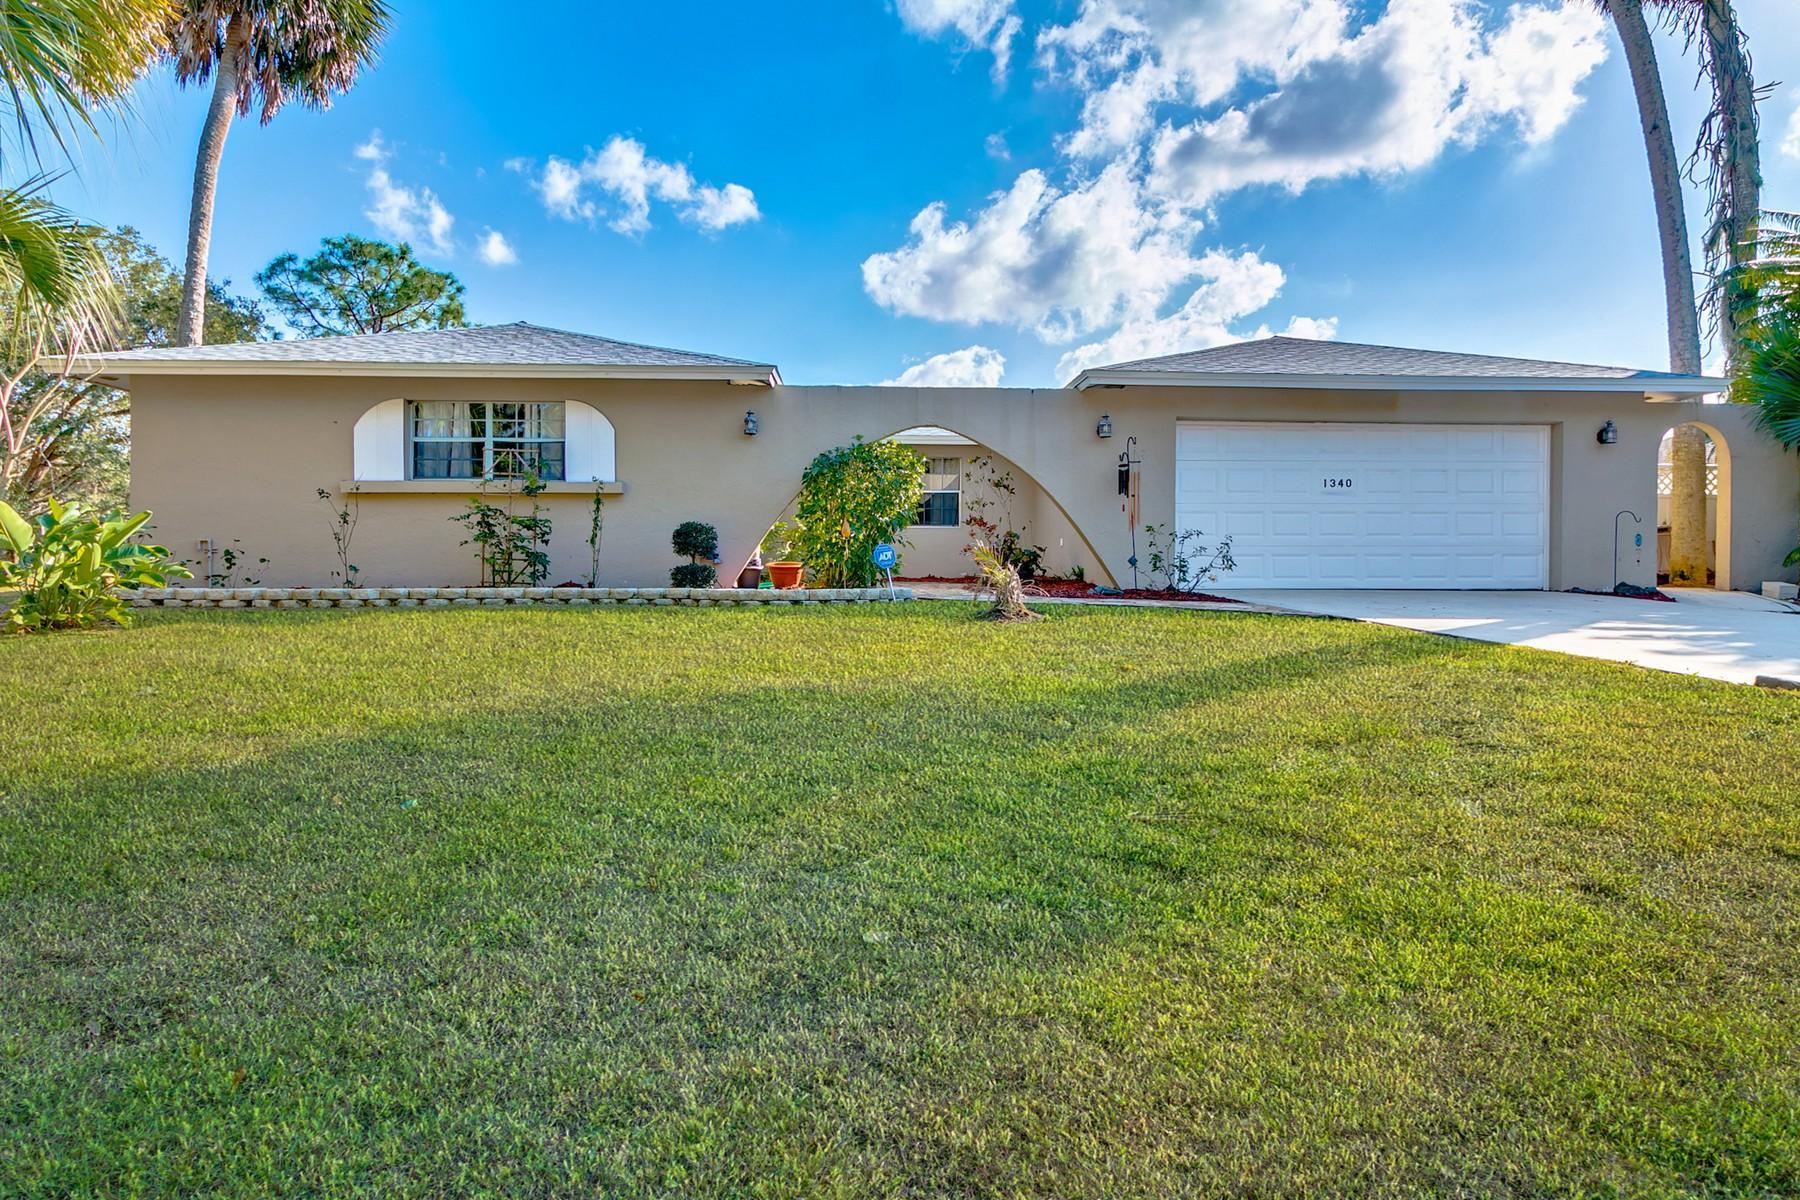 1340 Meadowbrook Rd NE, Palm Bay, FL 32905 - Estimate and Home ...